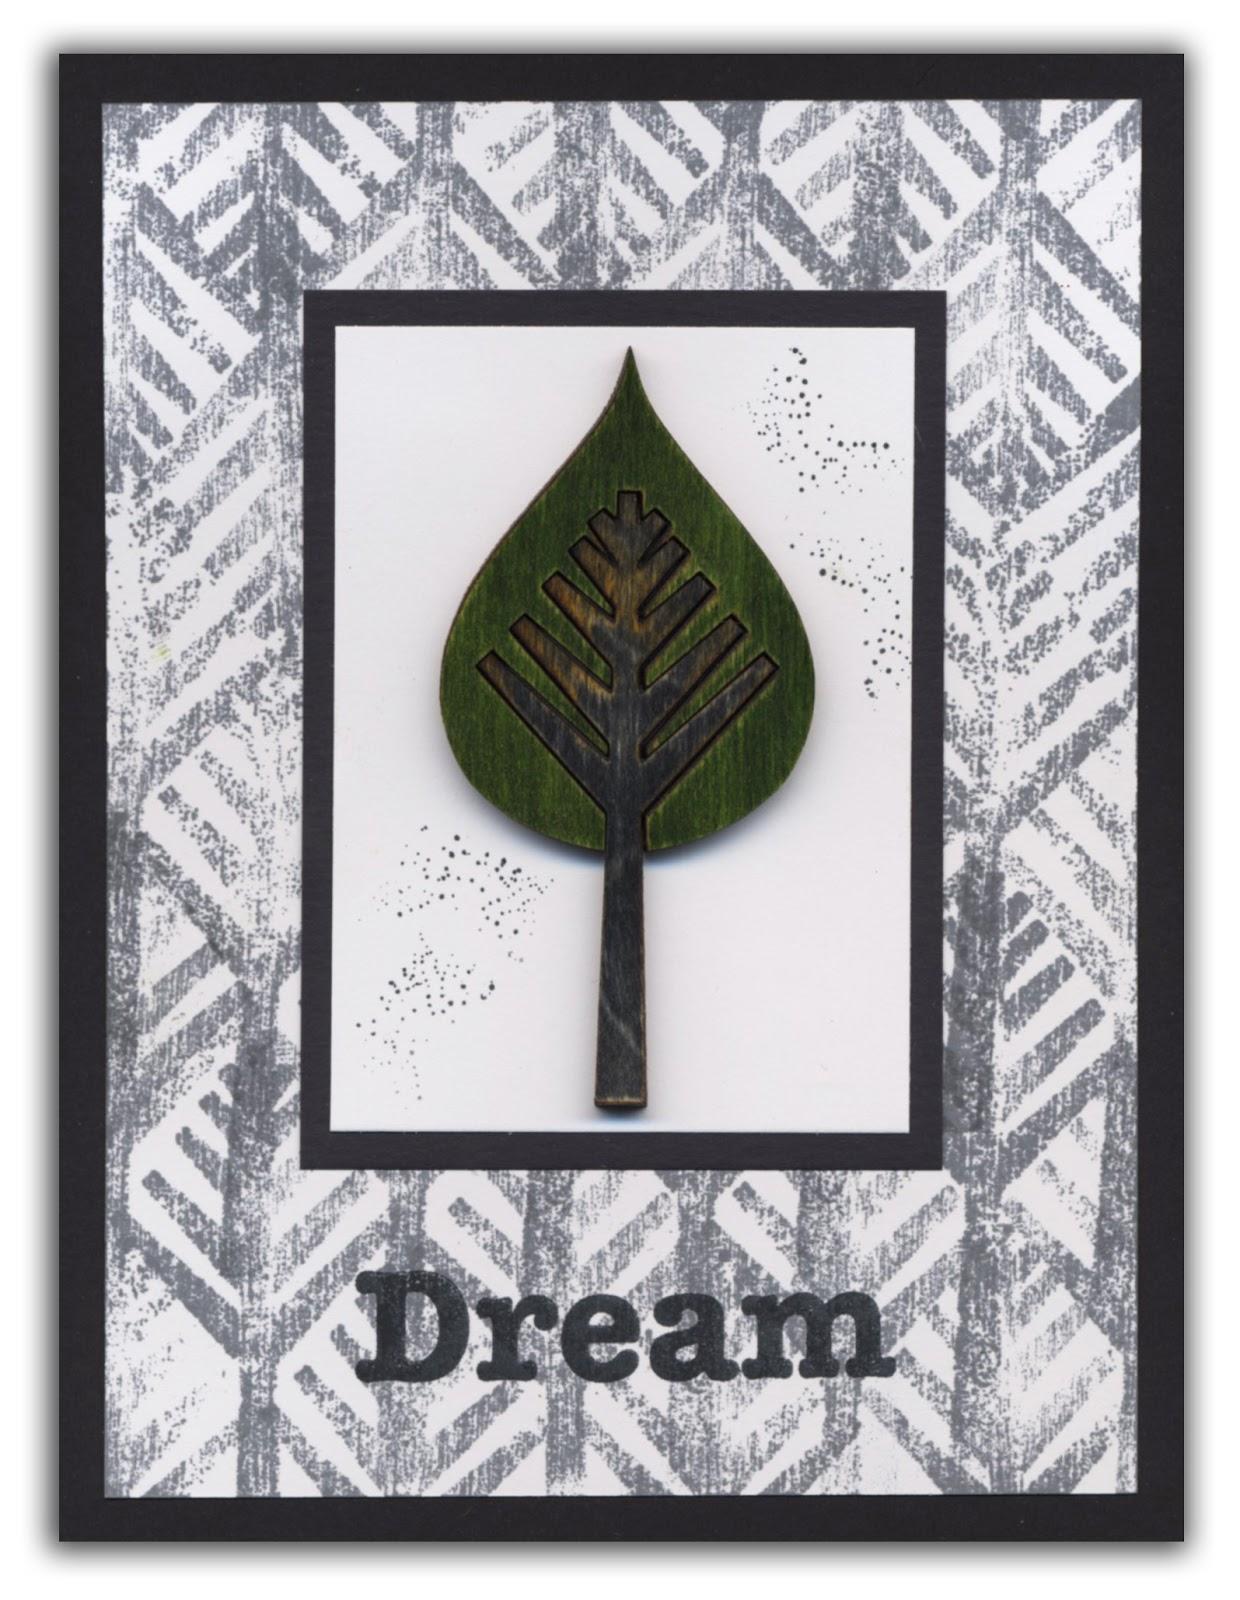 h l ne m tivier magentastyle d coupe de bois kdl05. Black Bedroom Furniture Sets. Home Design Ideas